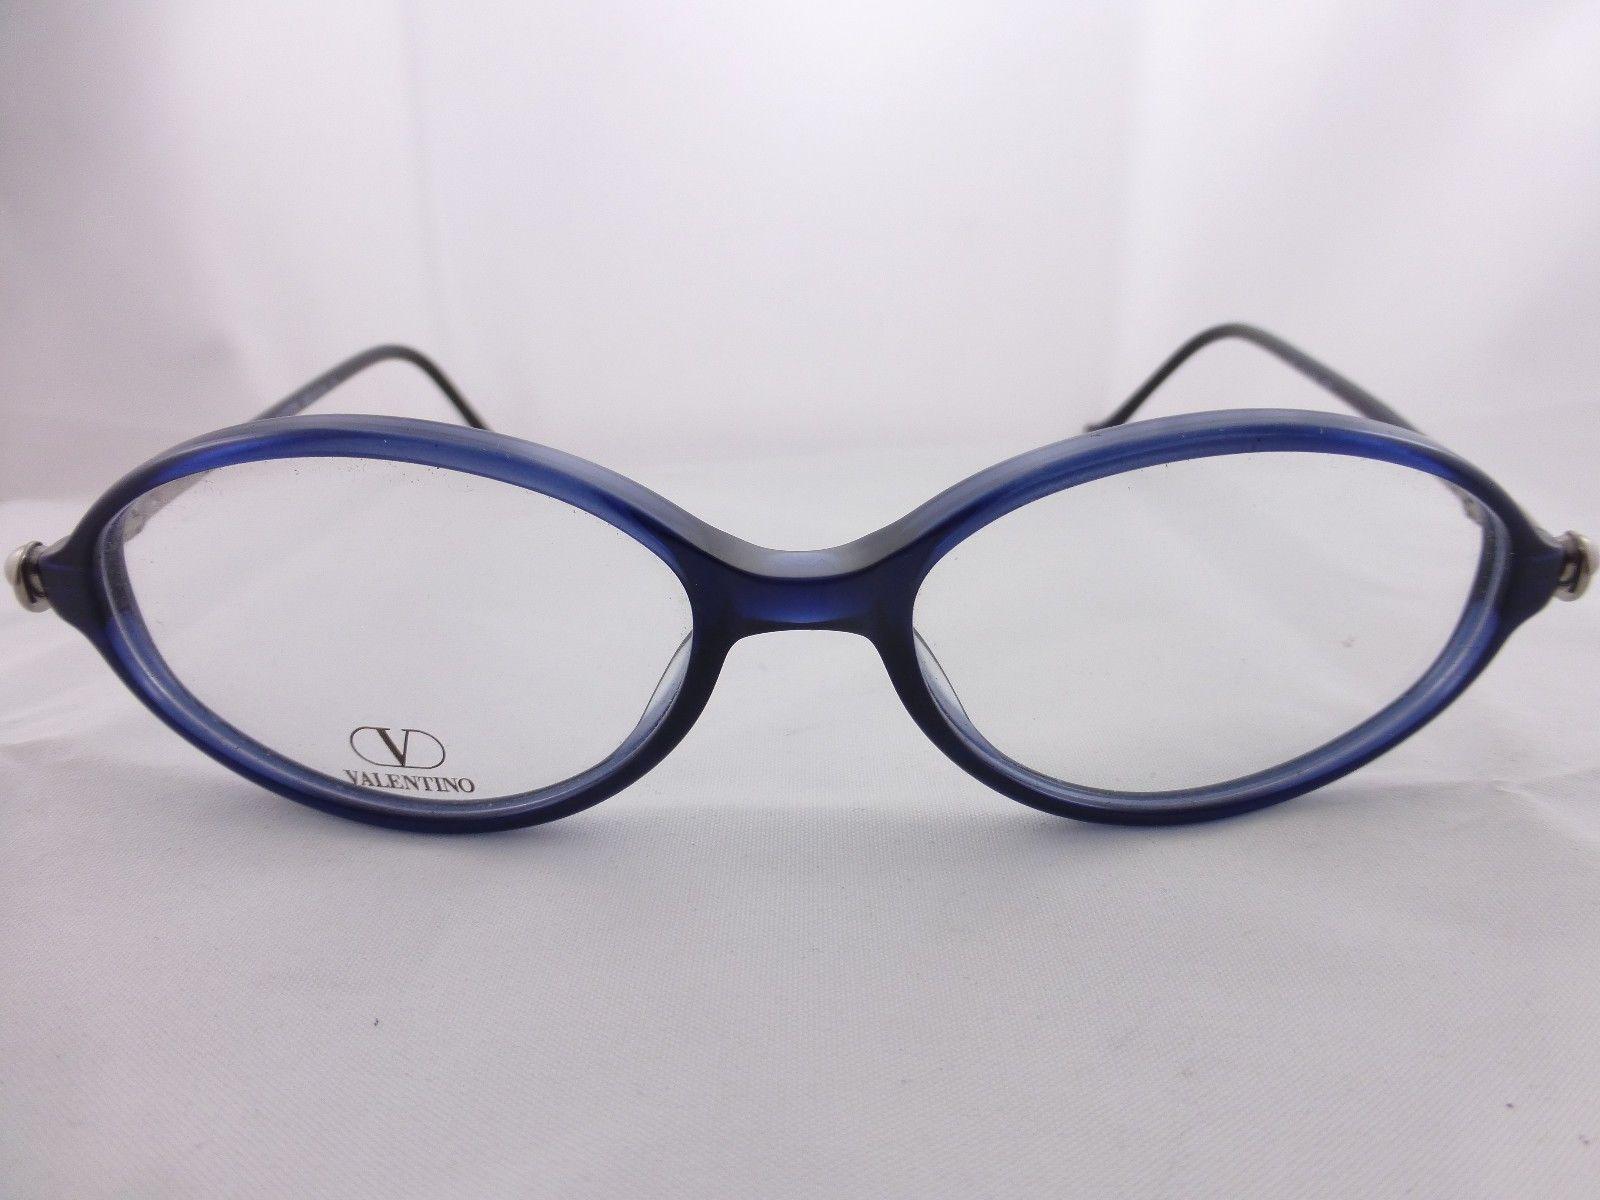 Valentino eyeglasses frame, Dark Blue and 33 similar items